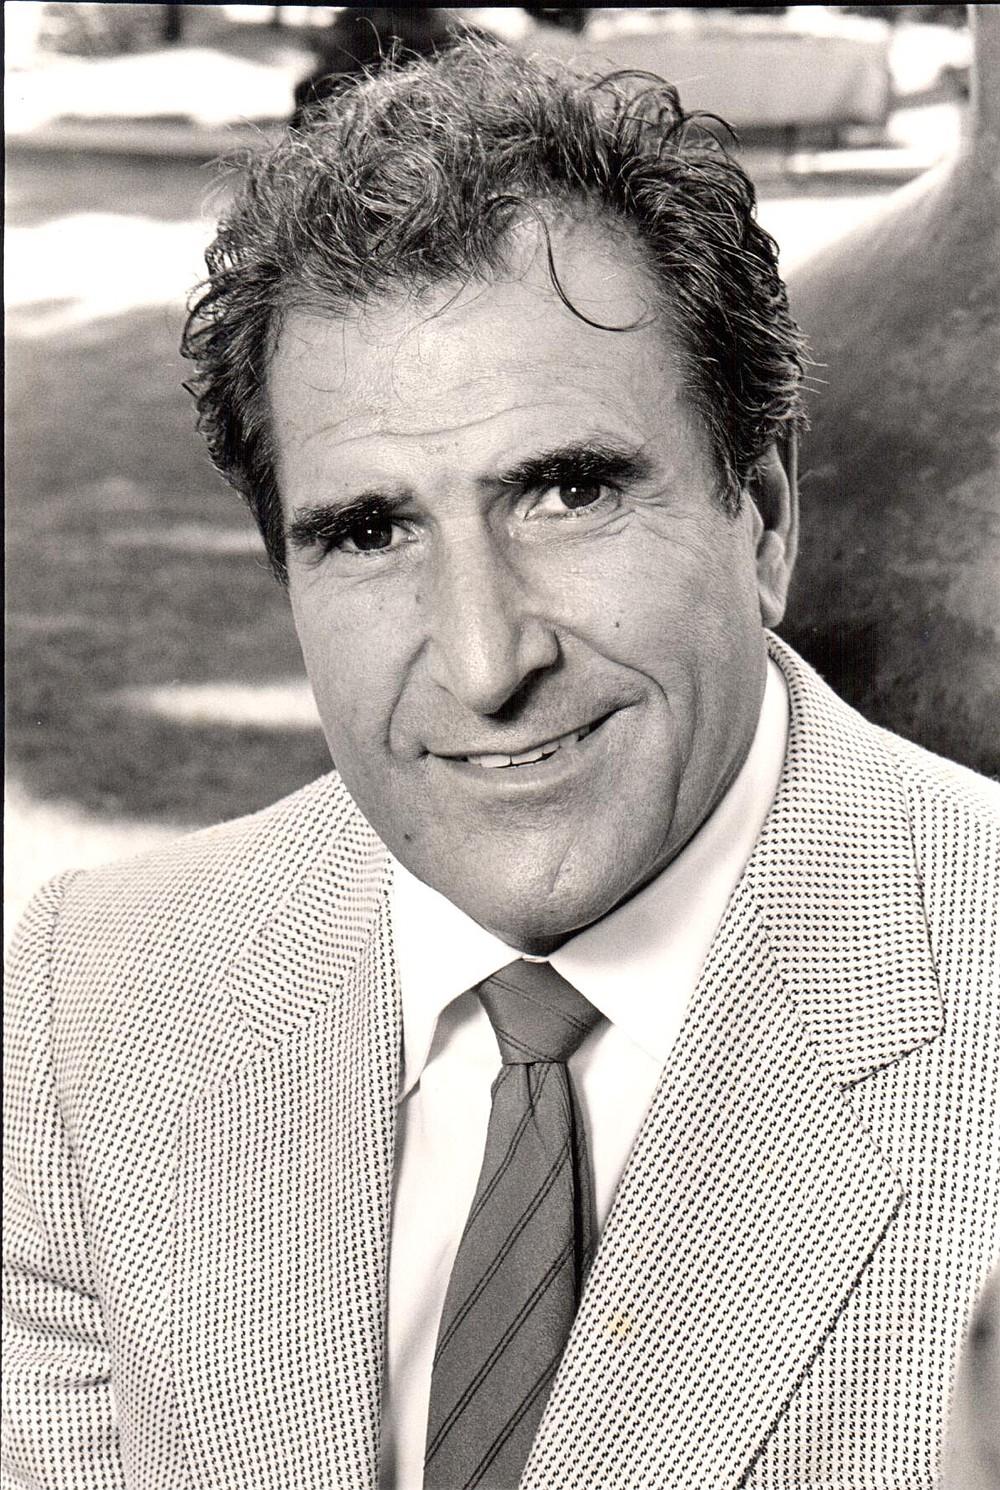 José Tasende